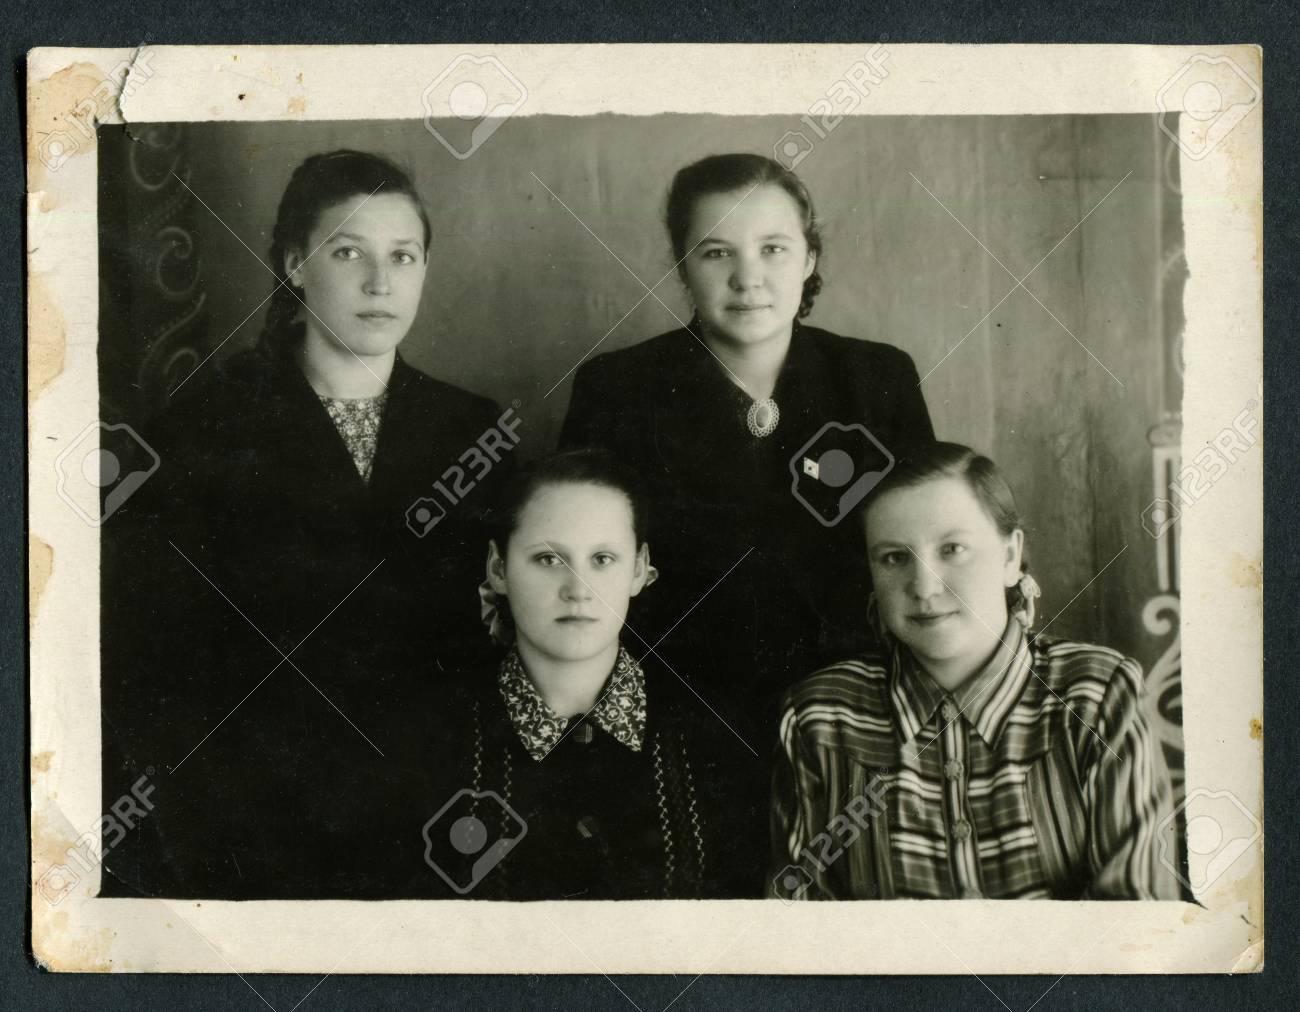 Stock photo ussr circa 1960s an antique black white photo show family portrait